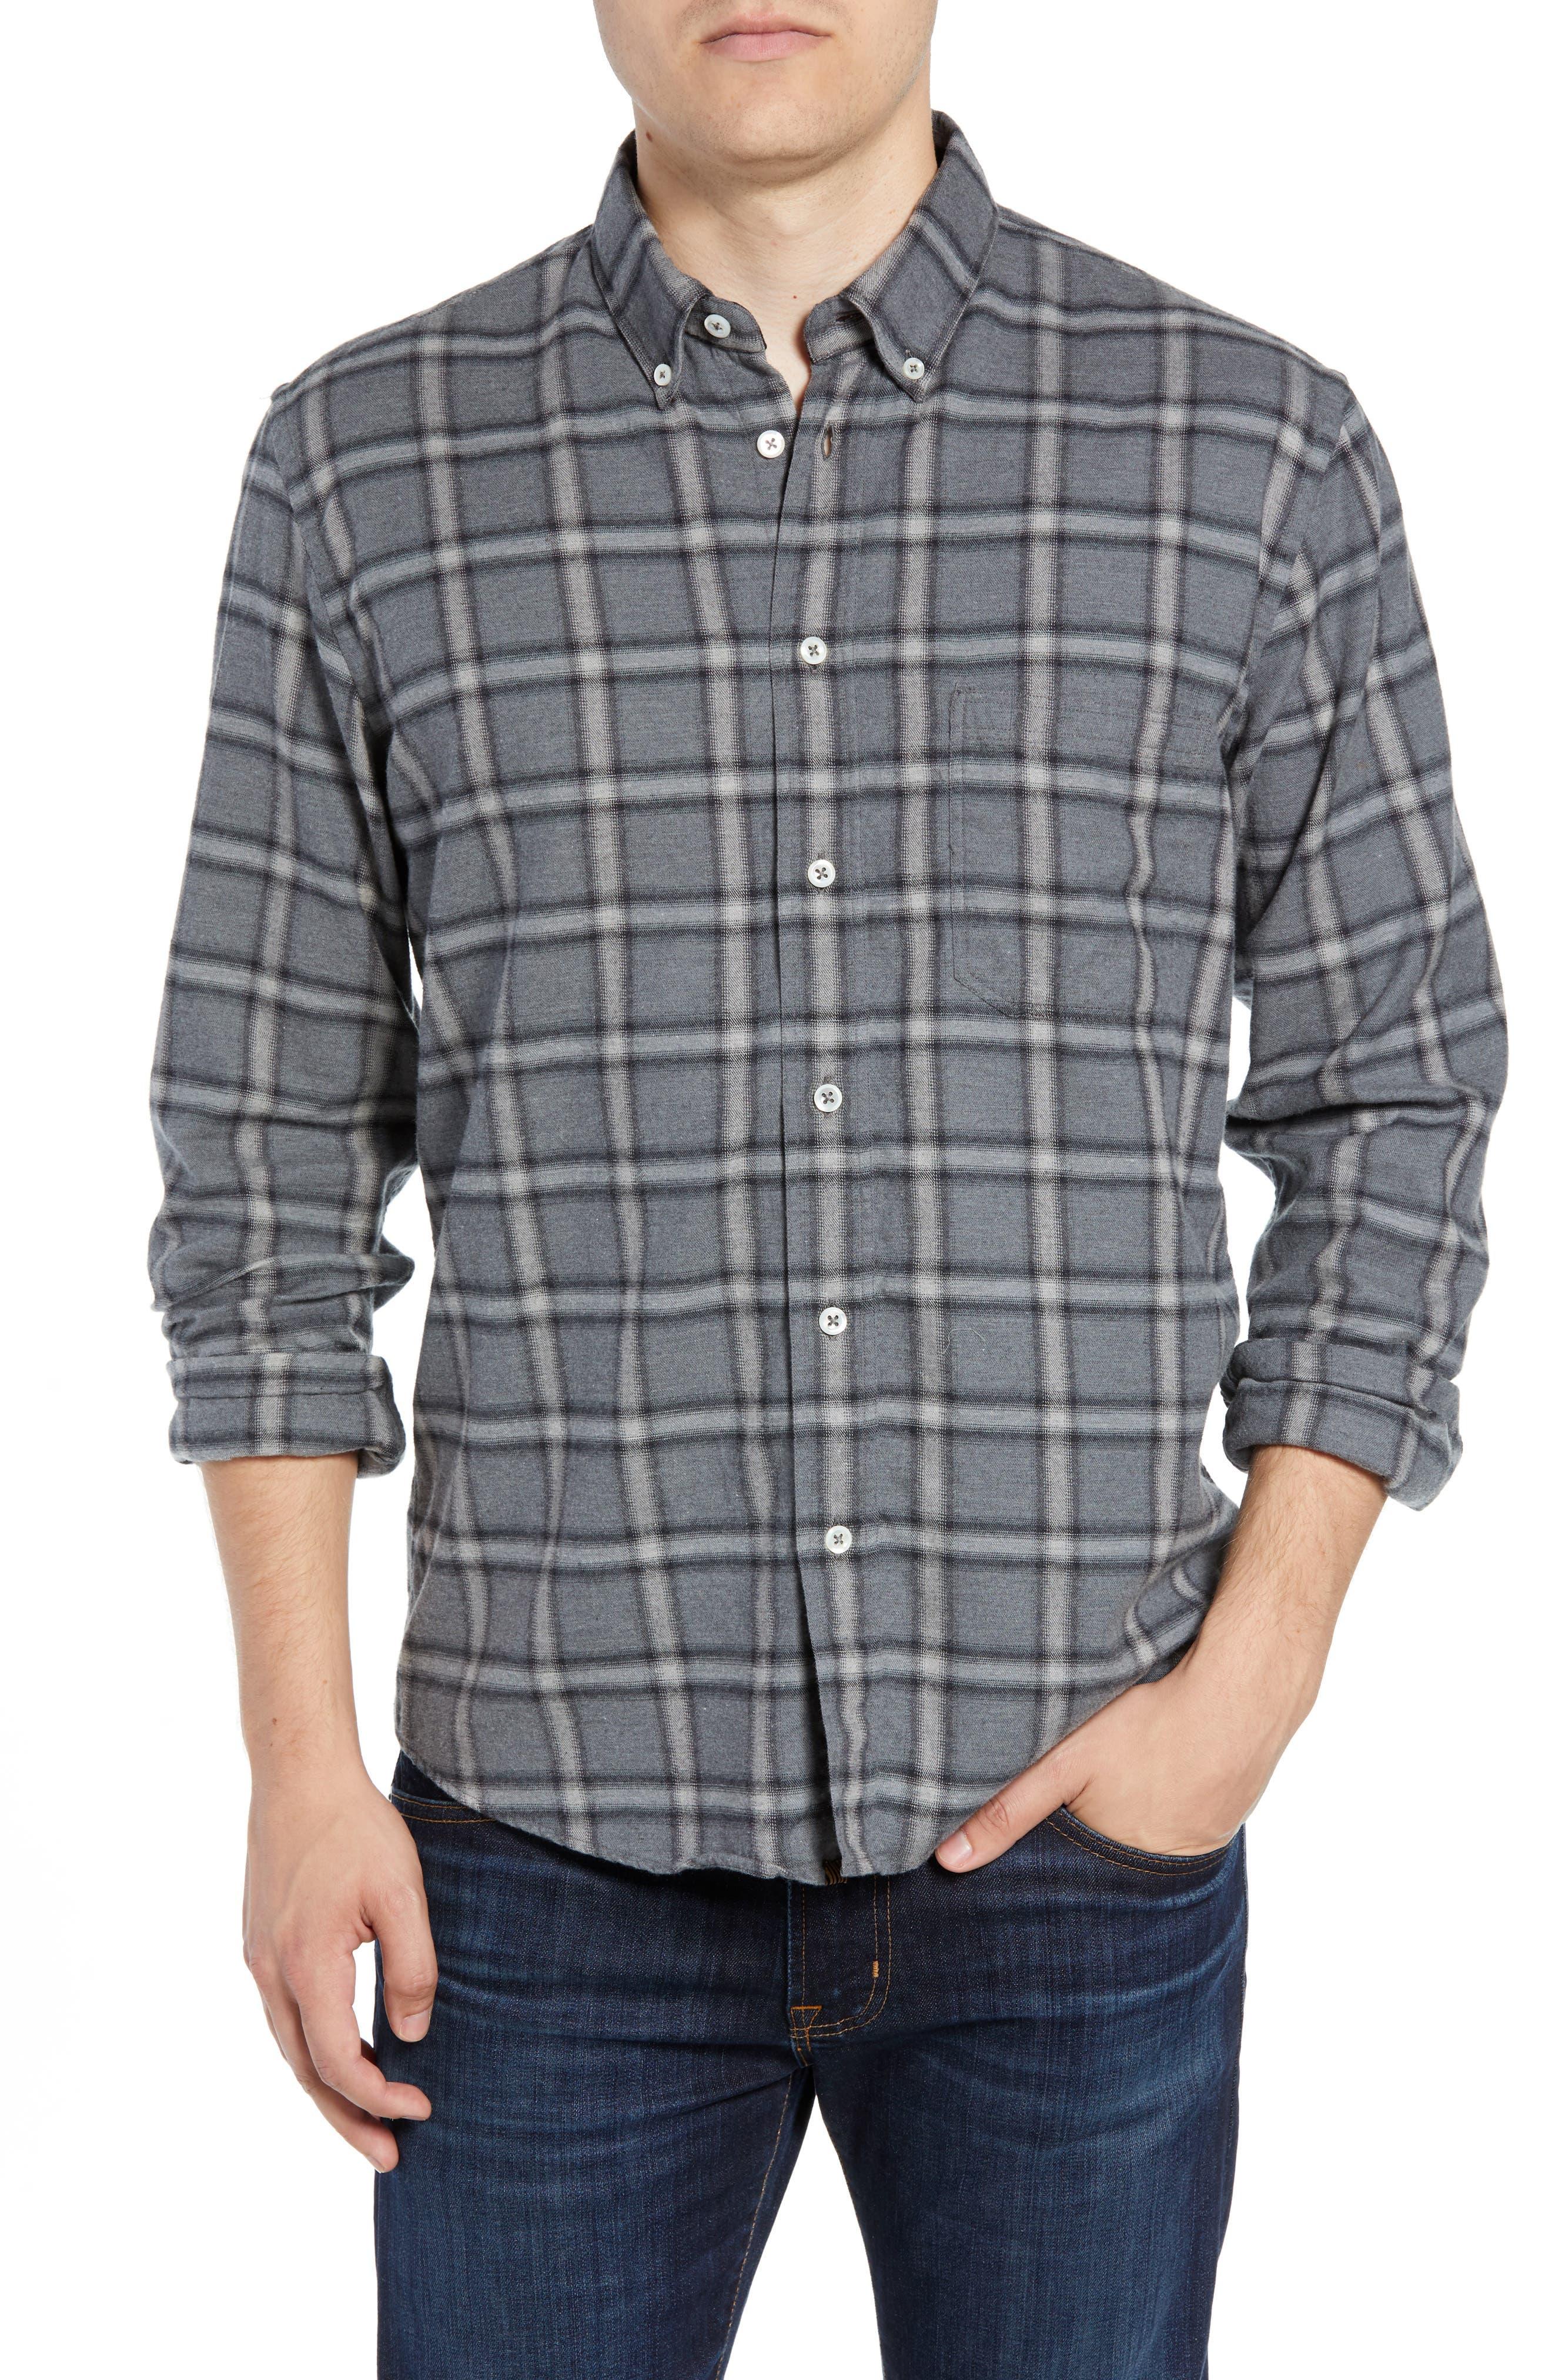 Tuscumbia Regular Fit Plaid Sport Shirt,                         Main,                         color, BLUE/ GREY